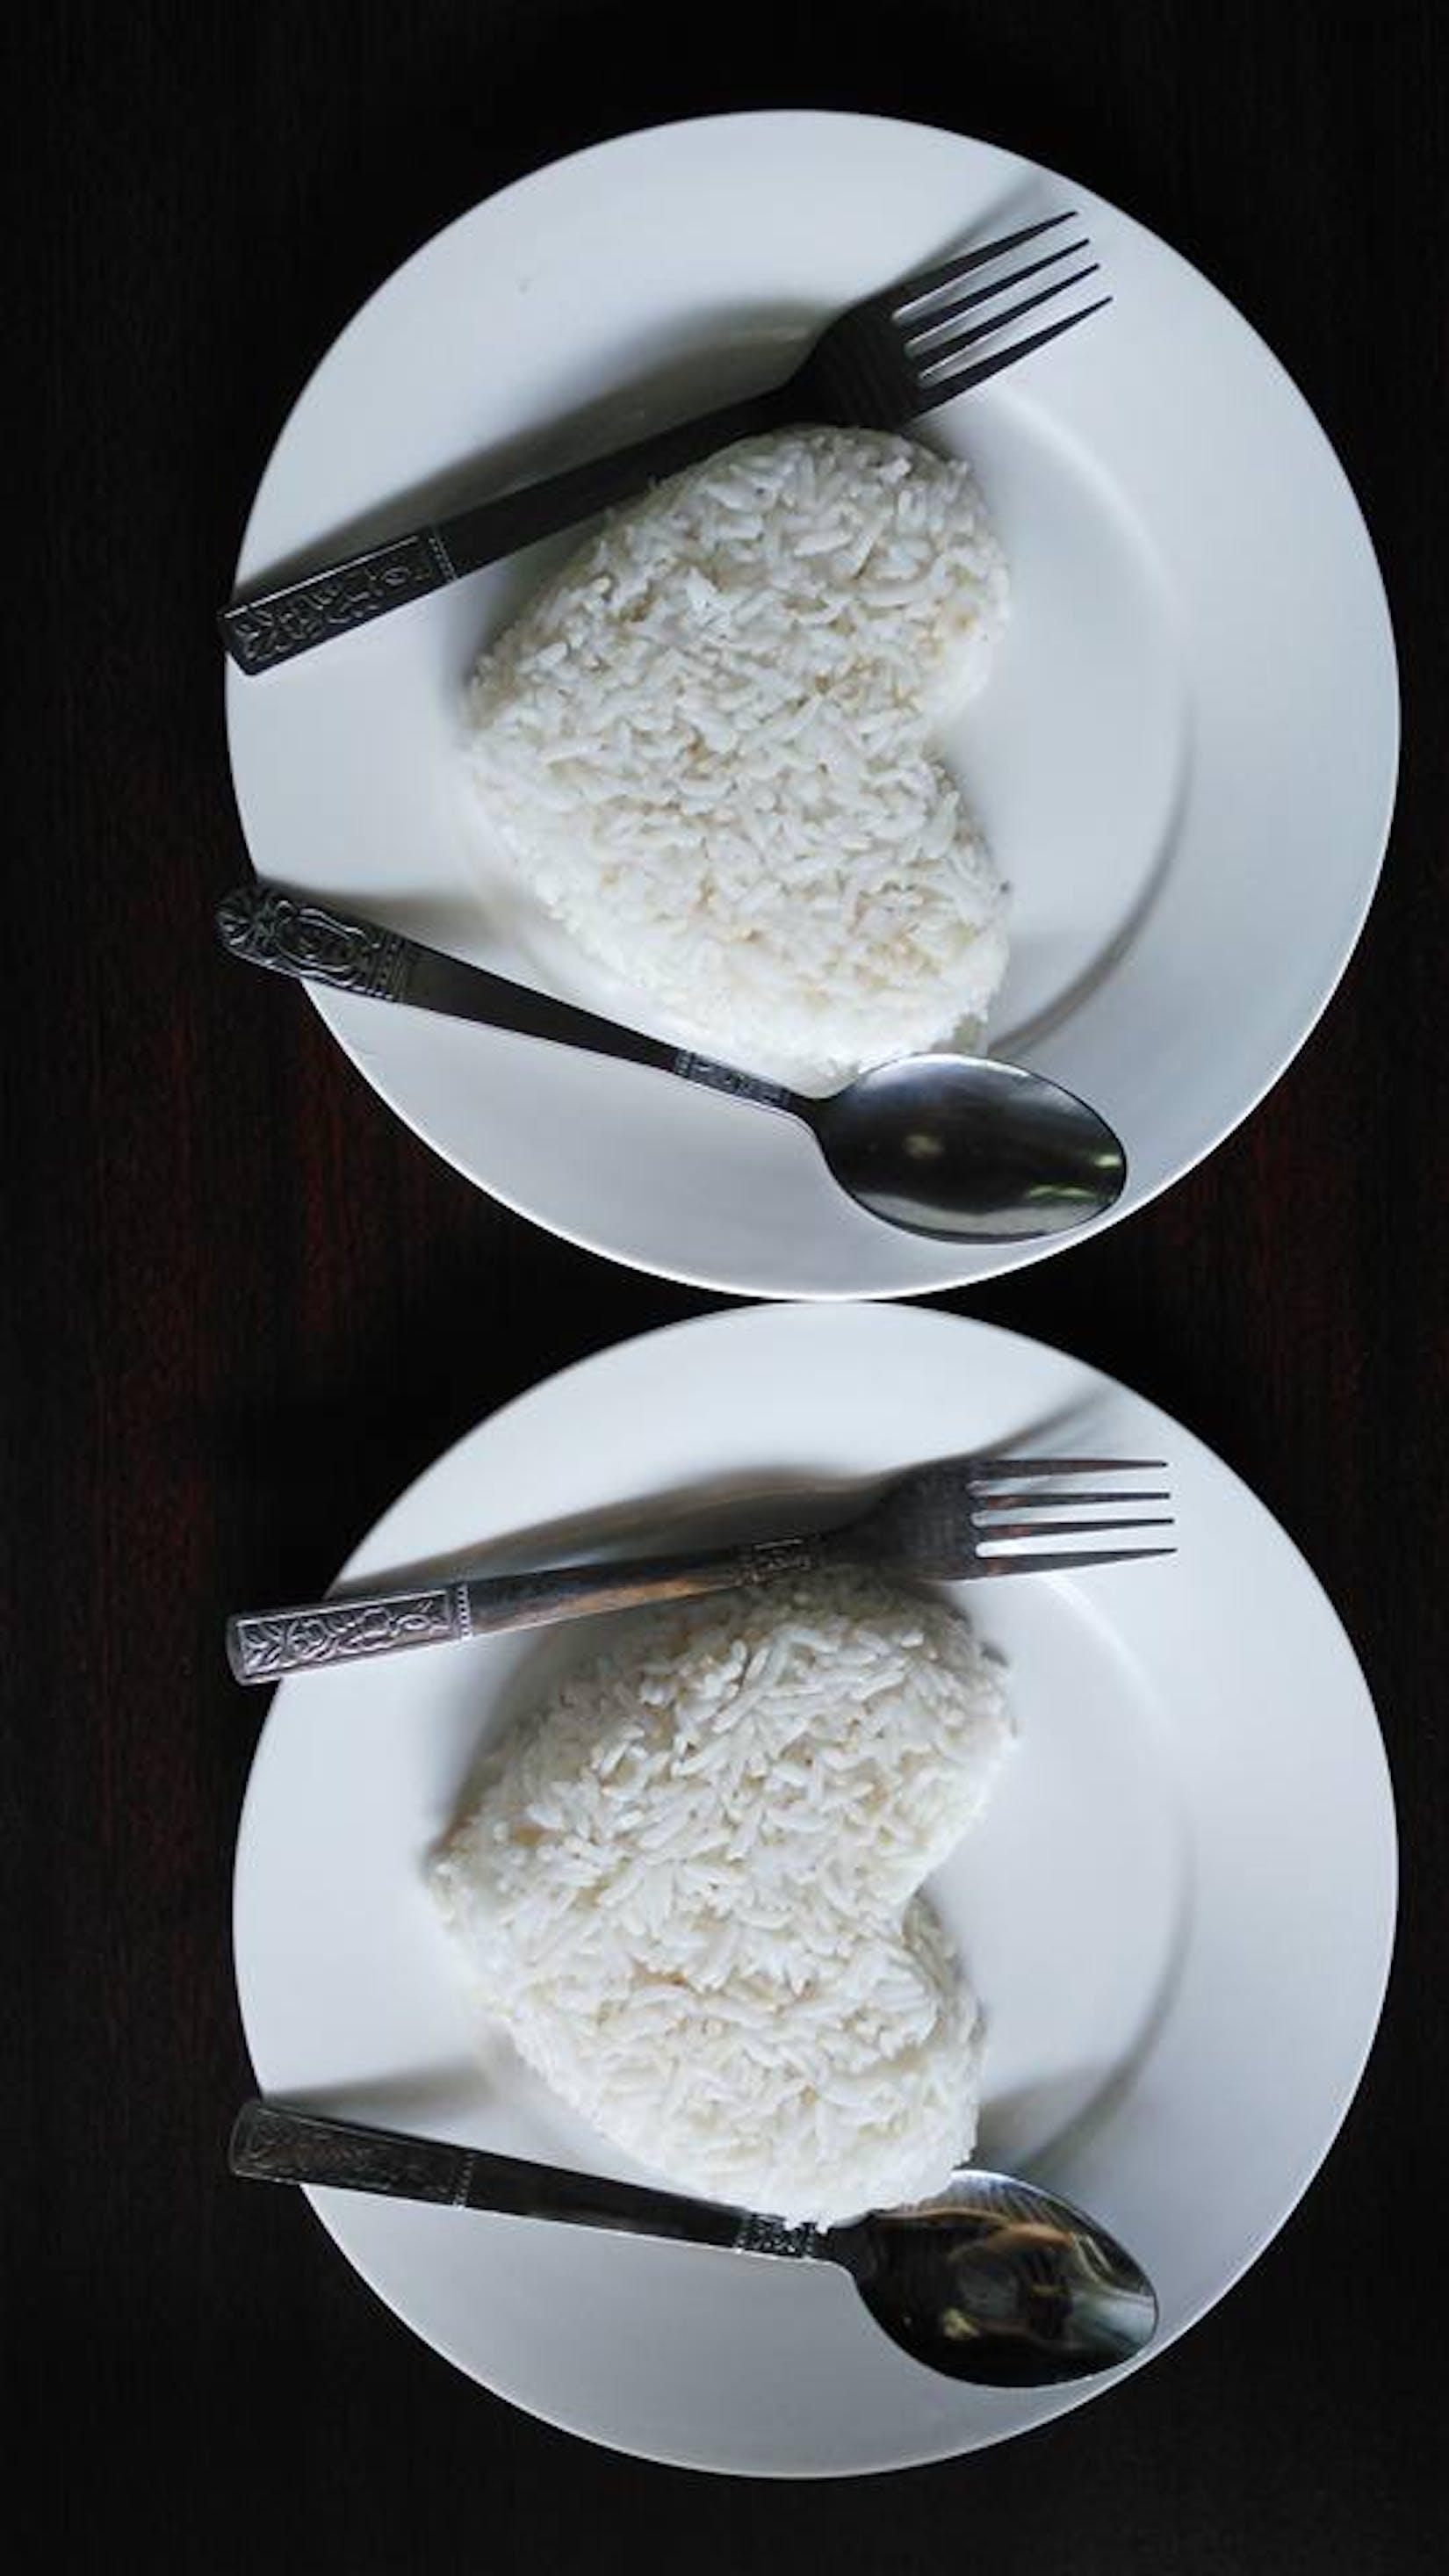 Shwe Inn Lay (Chinese Food) | yathar